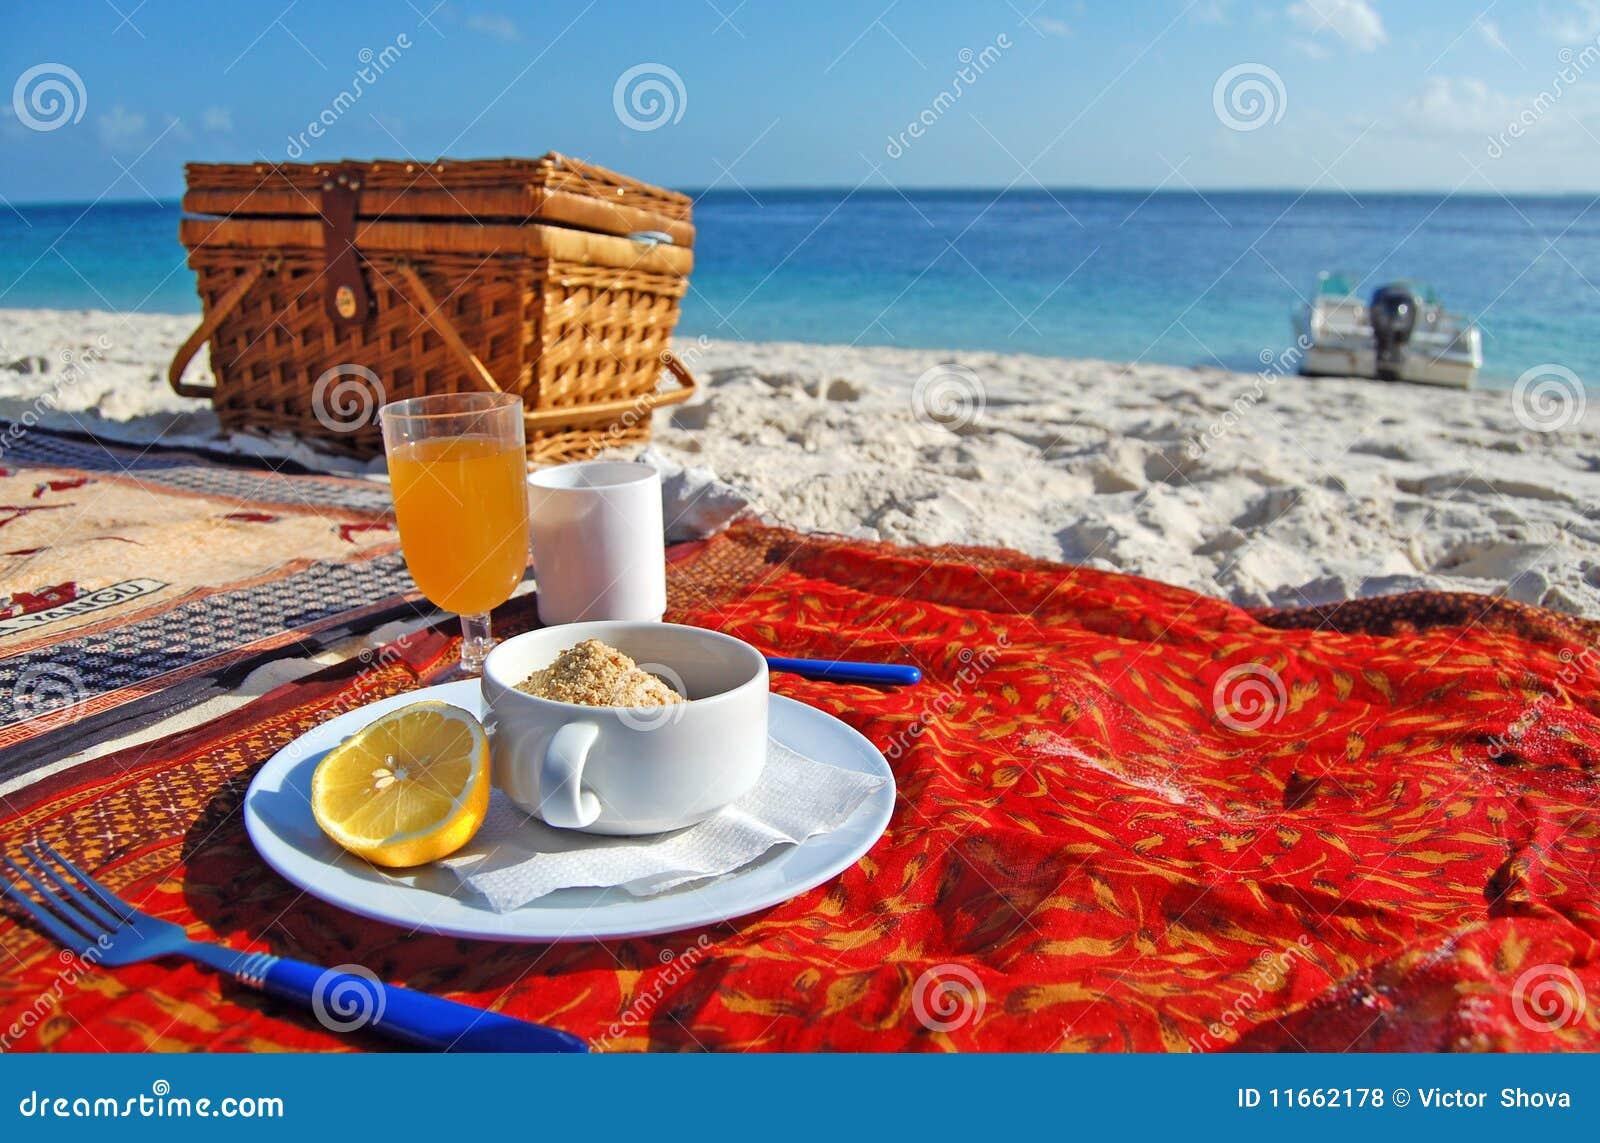 refreshing-breakfast-tropical-beach-1166